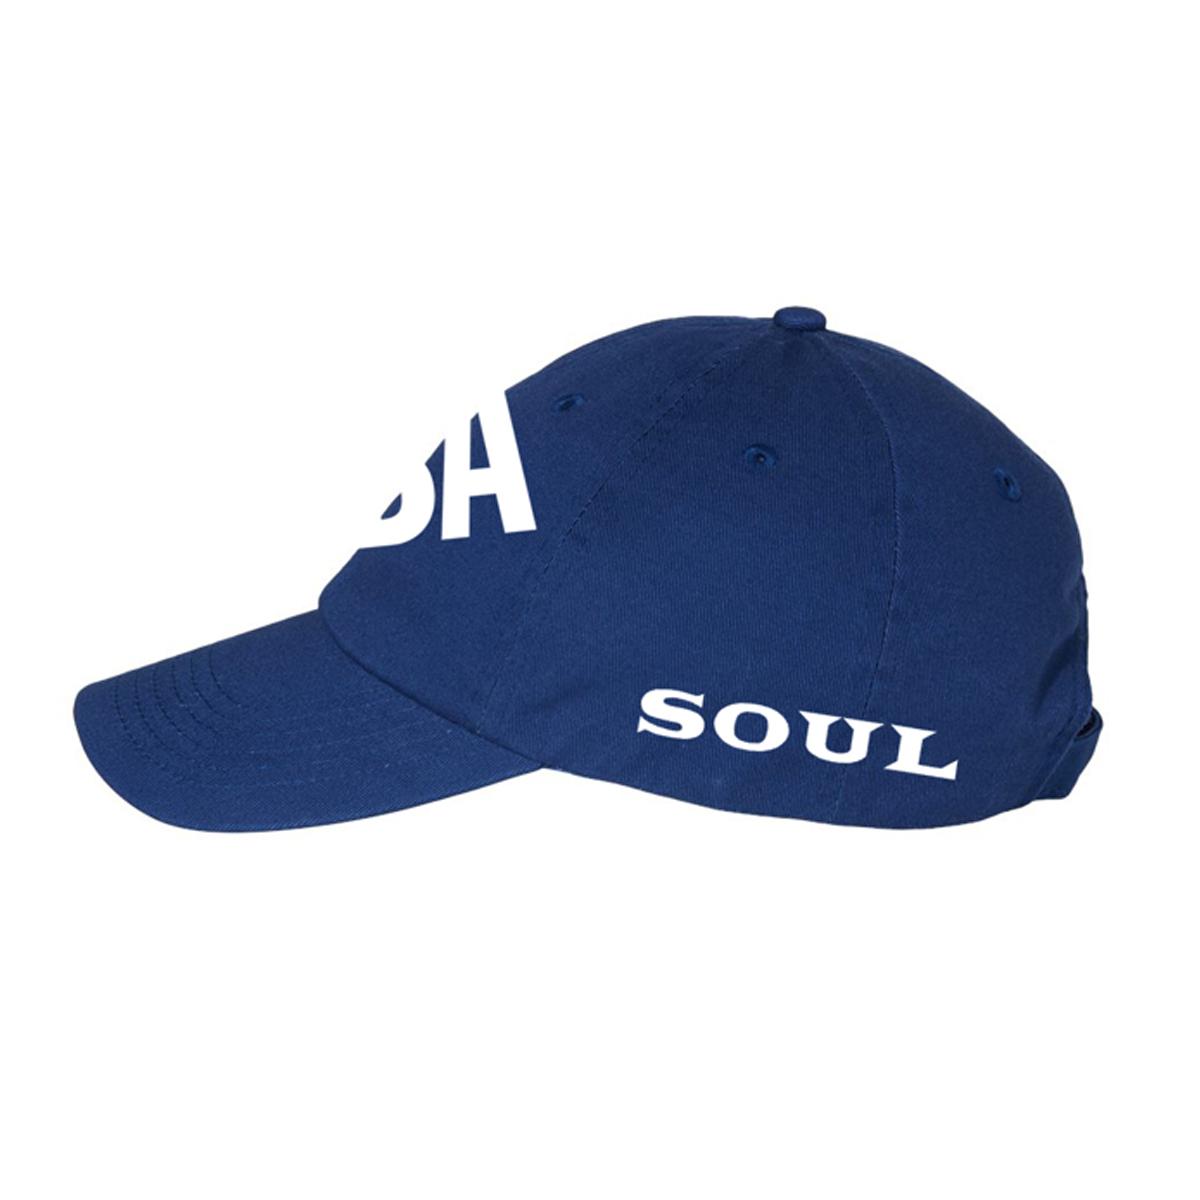 Soul Dream Hat